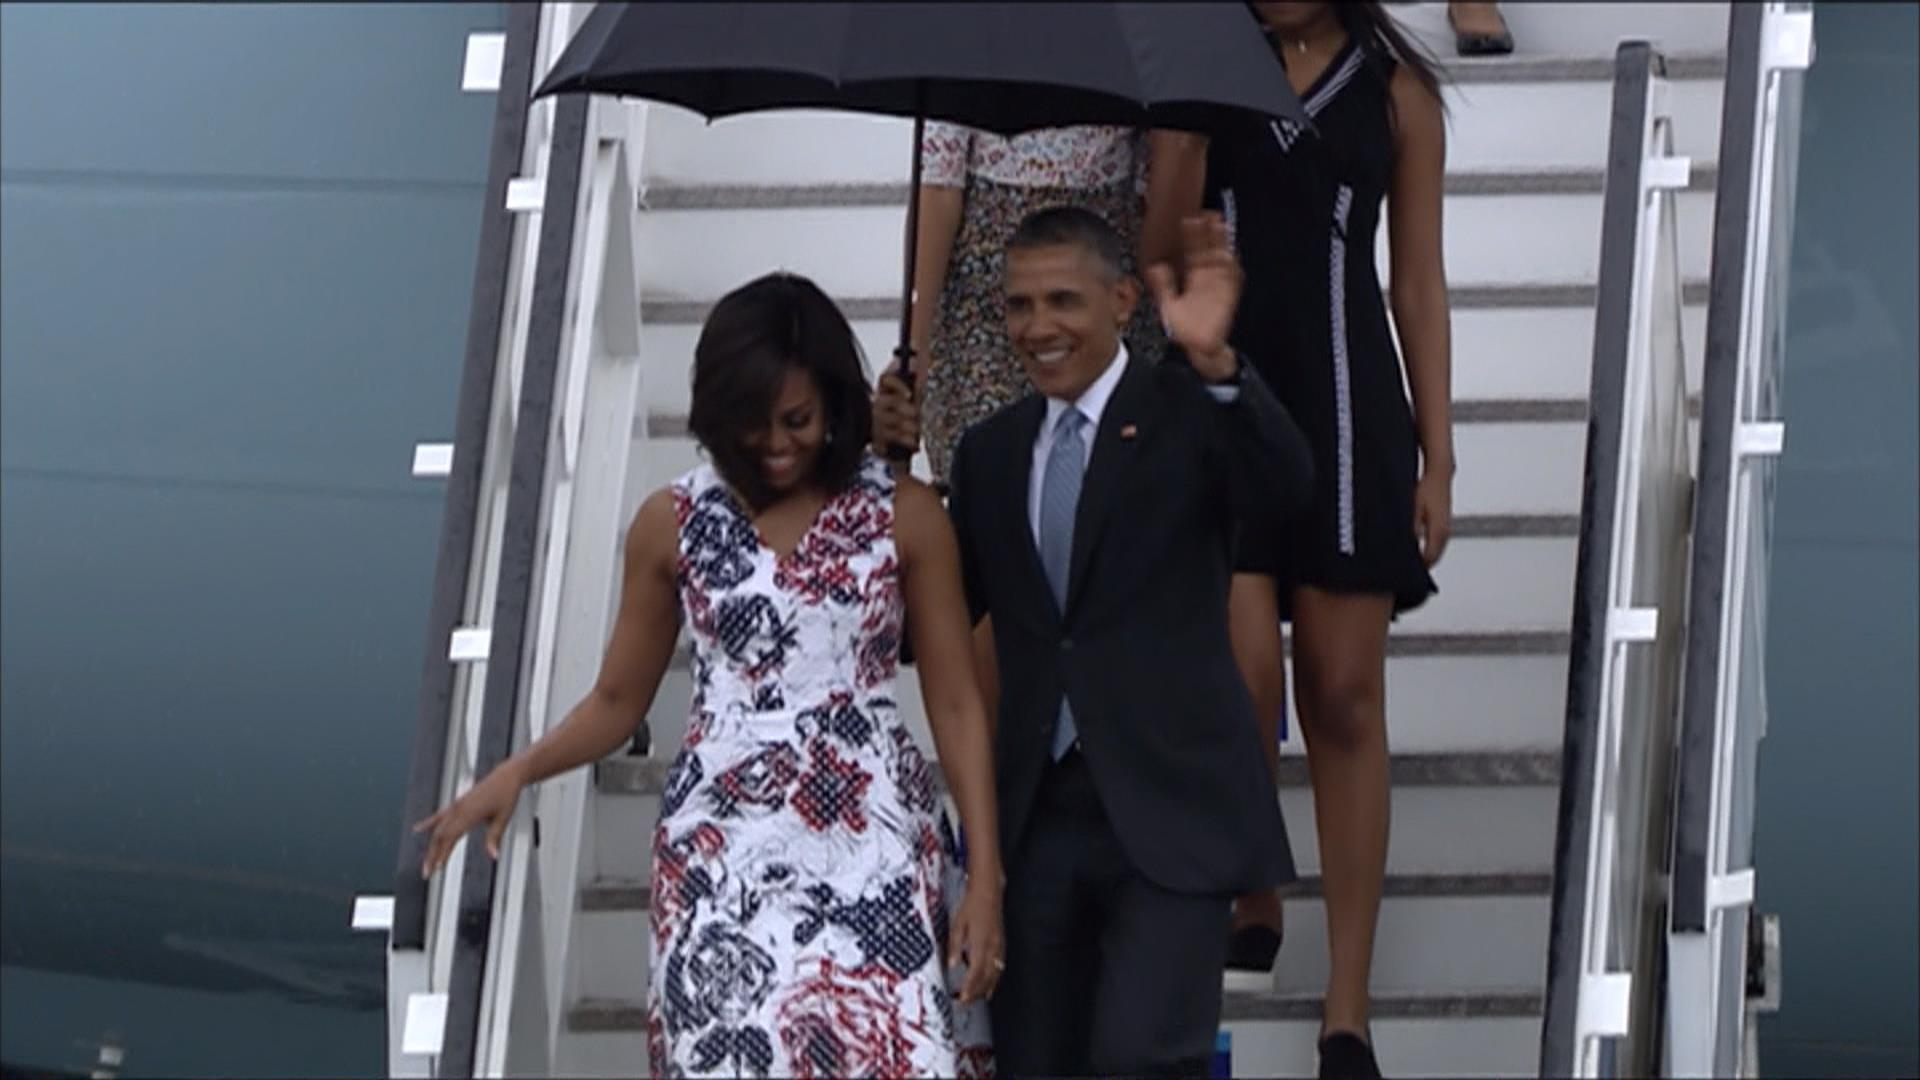 Obamas Arrive in Cuba